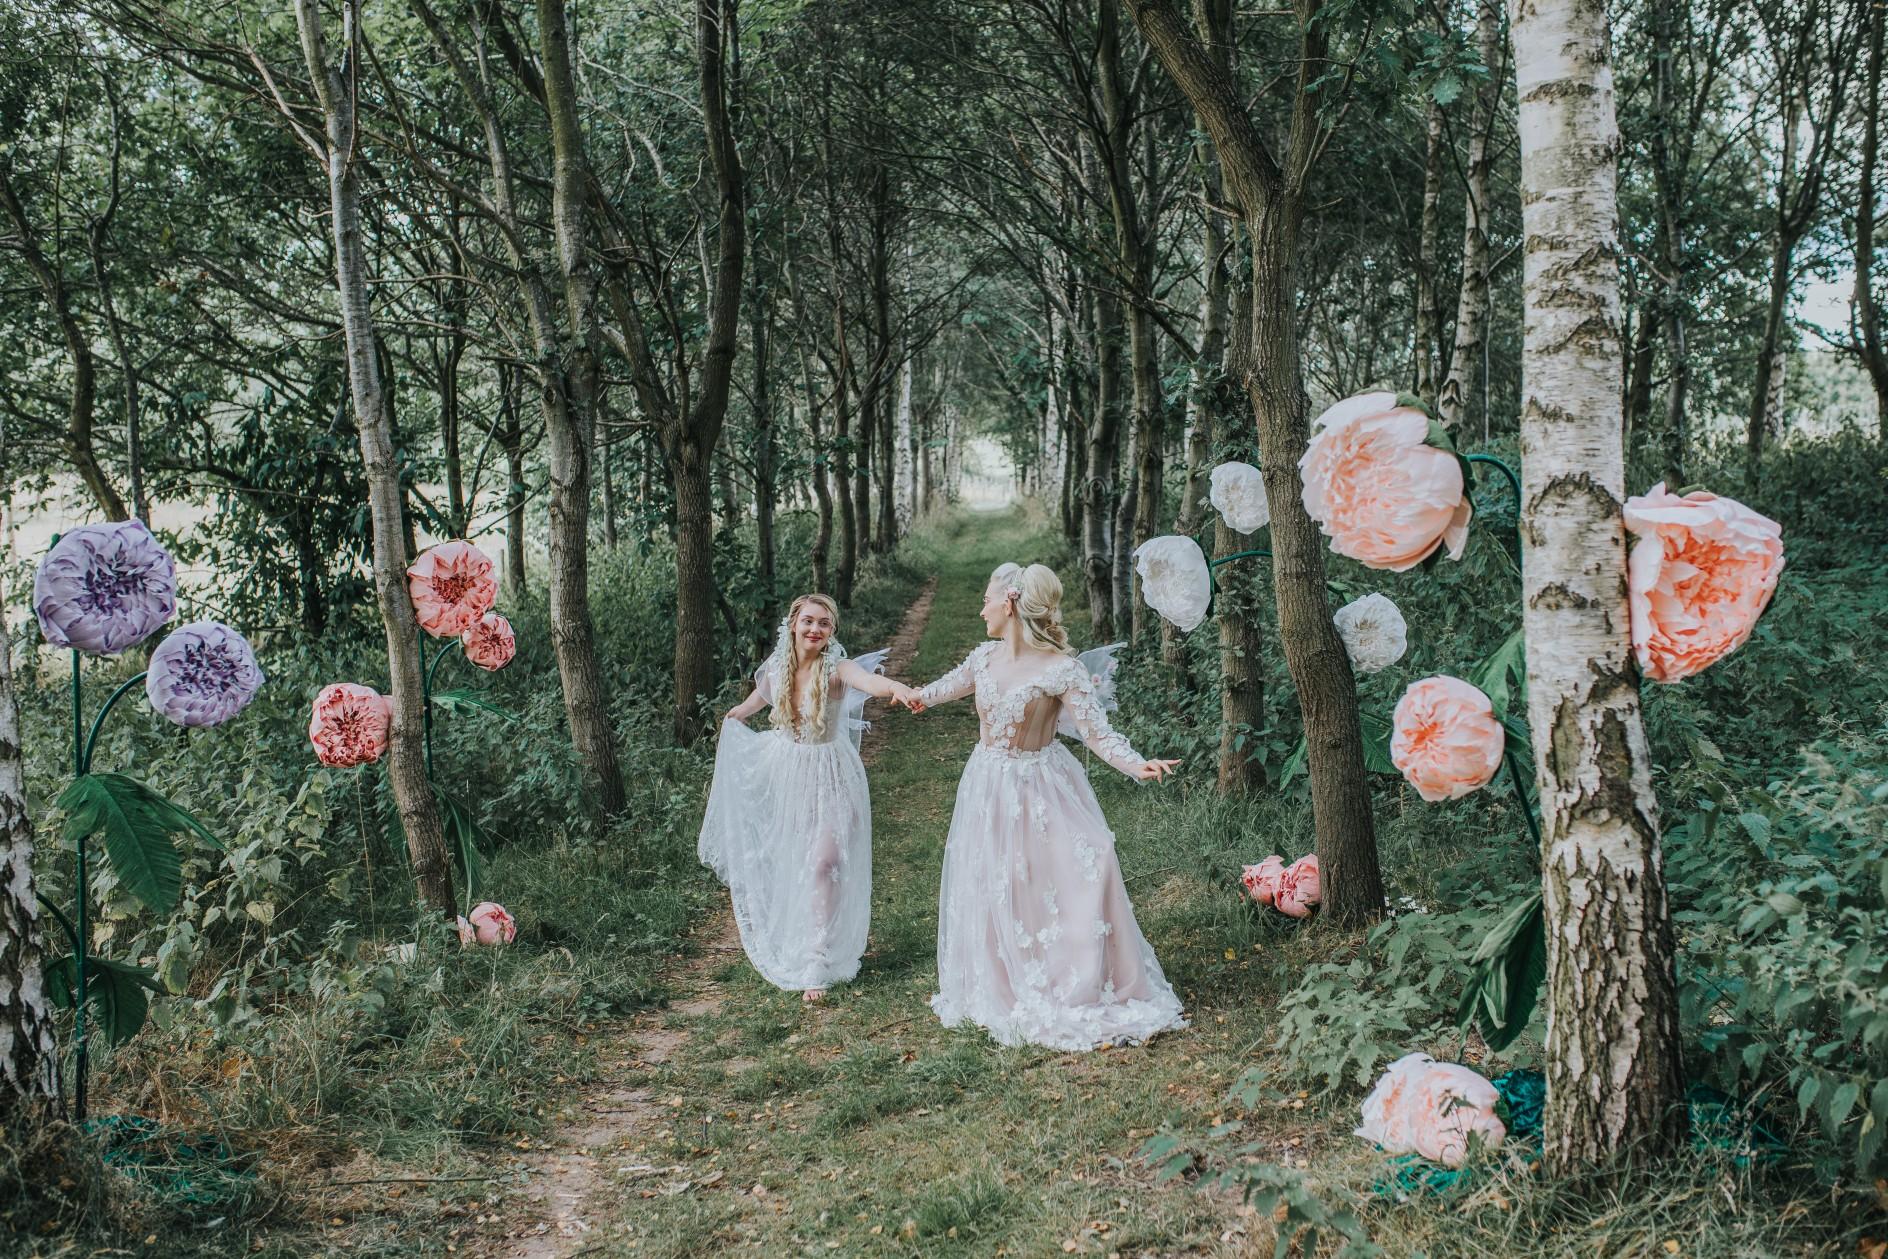 fairy wedding - whimsical wedding - magical wedding - elegant wedding dress - woodland wedding